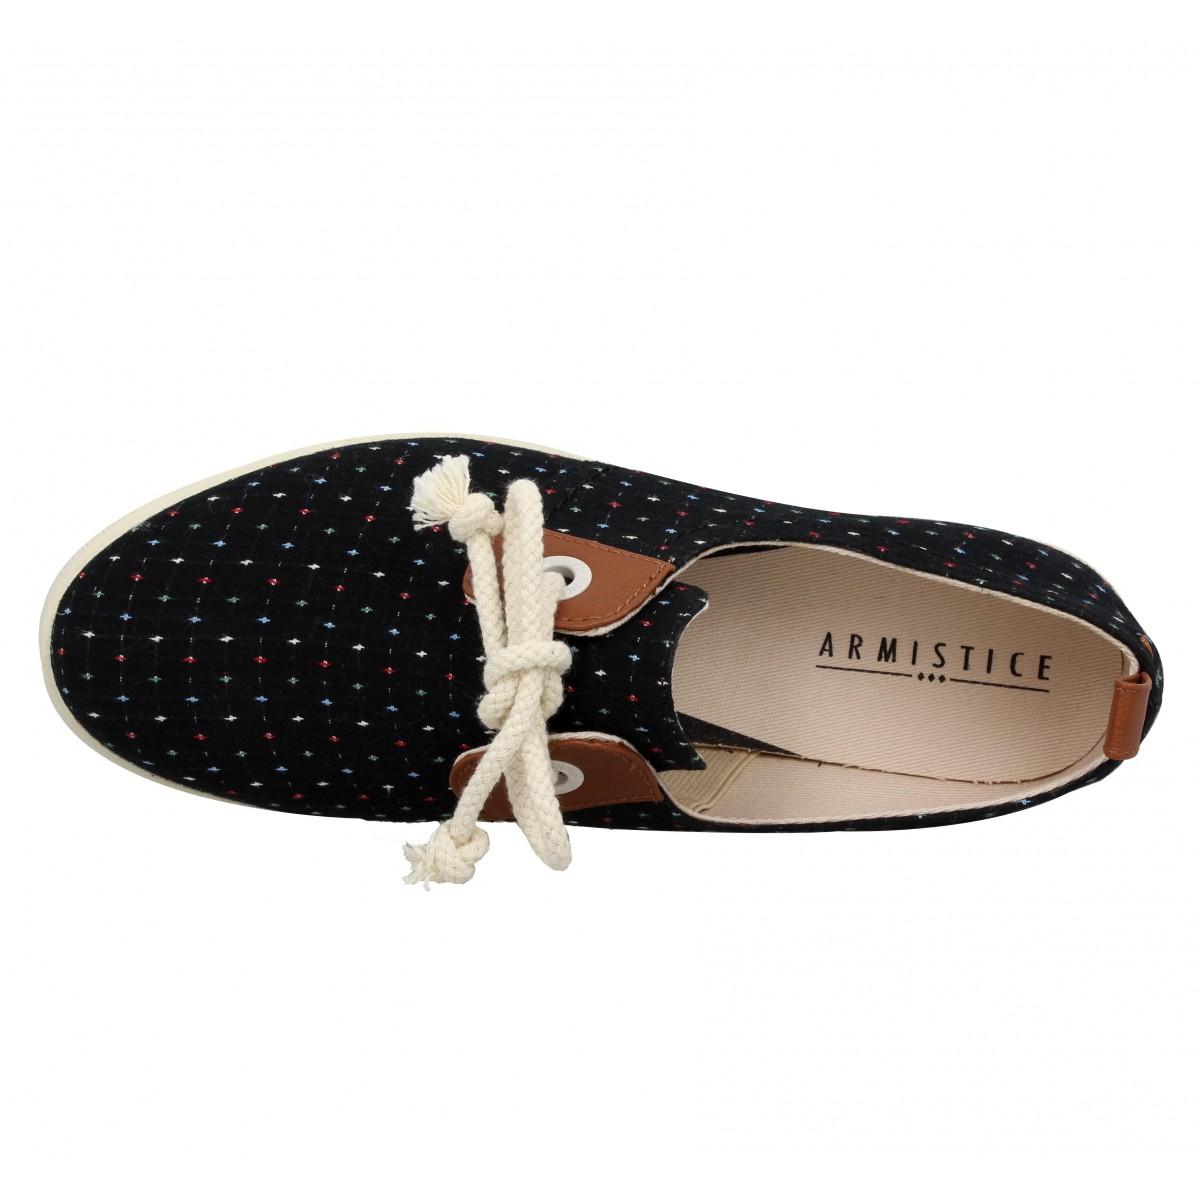 soldes armistice stone one toile sweet femme noir fanny chaussures. Black Bedroom Furniture Sets. Home Design Ideas